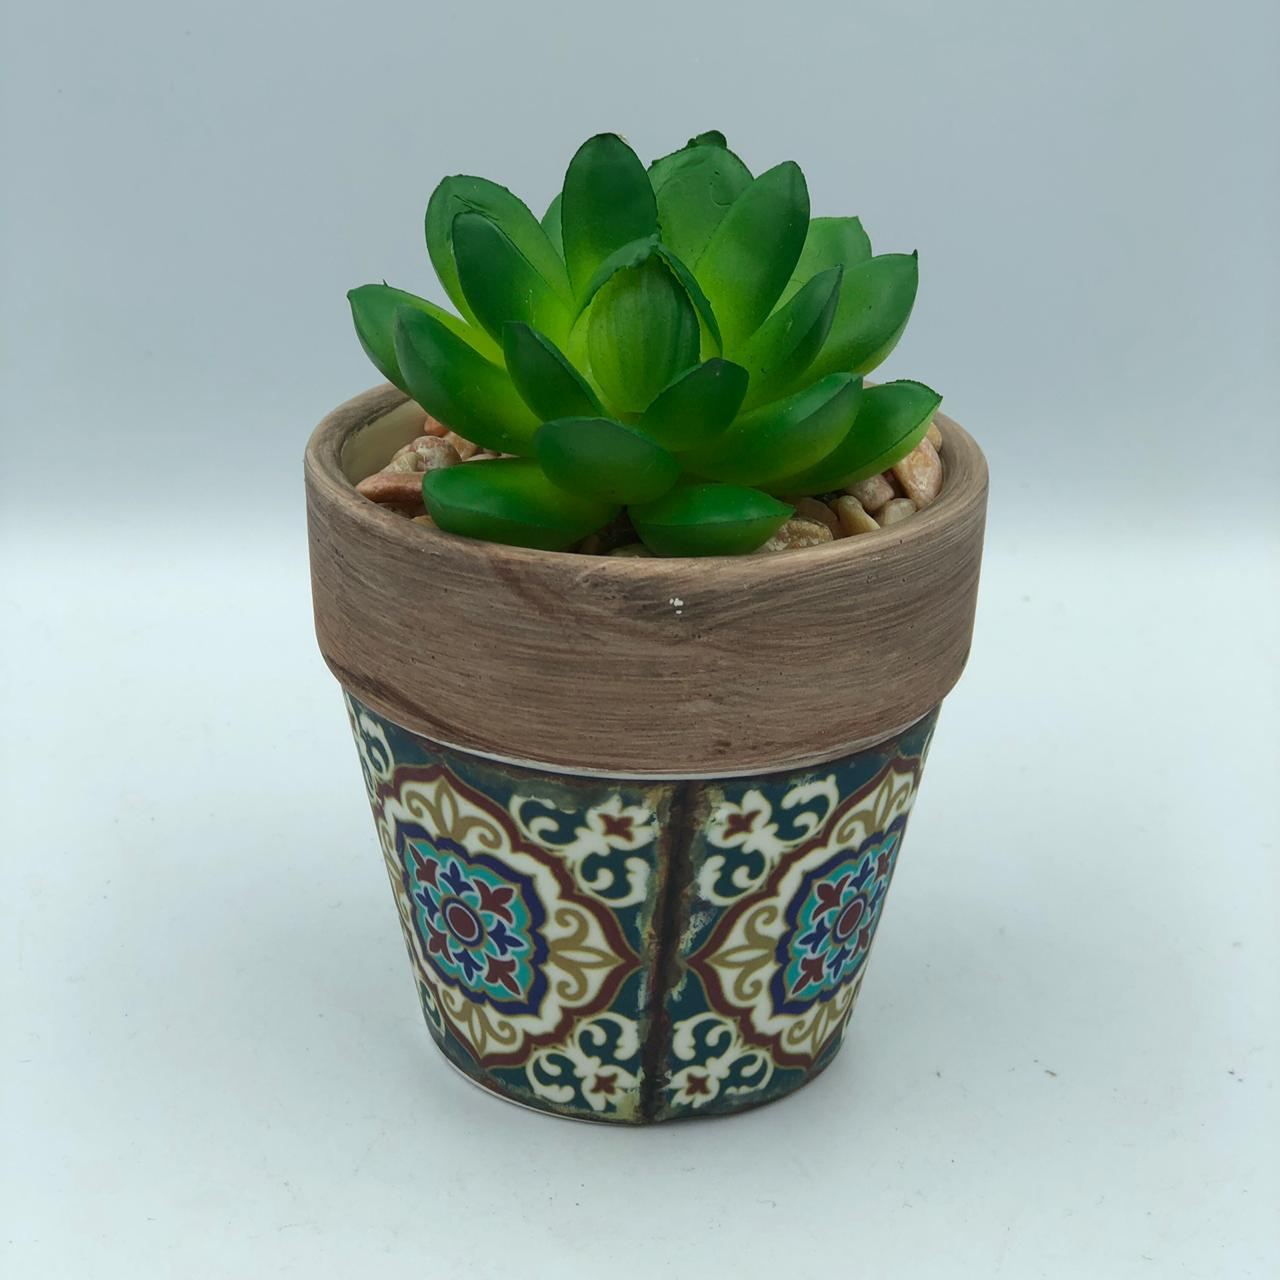 Vaso Decorativo de Porcelana Azulejo e Suculenta Artificial